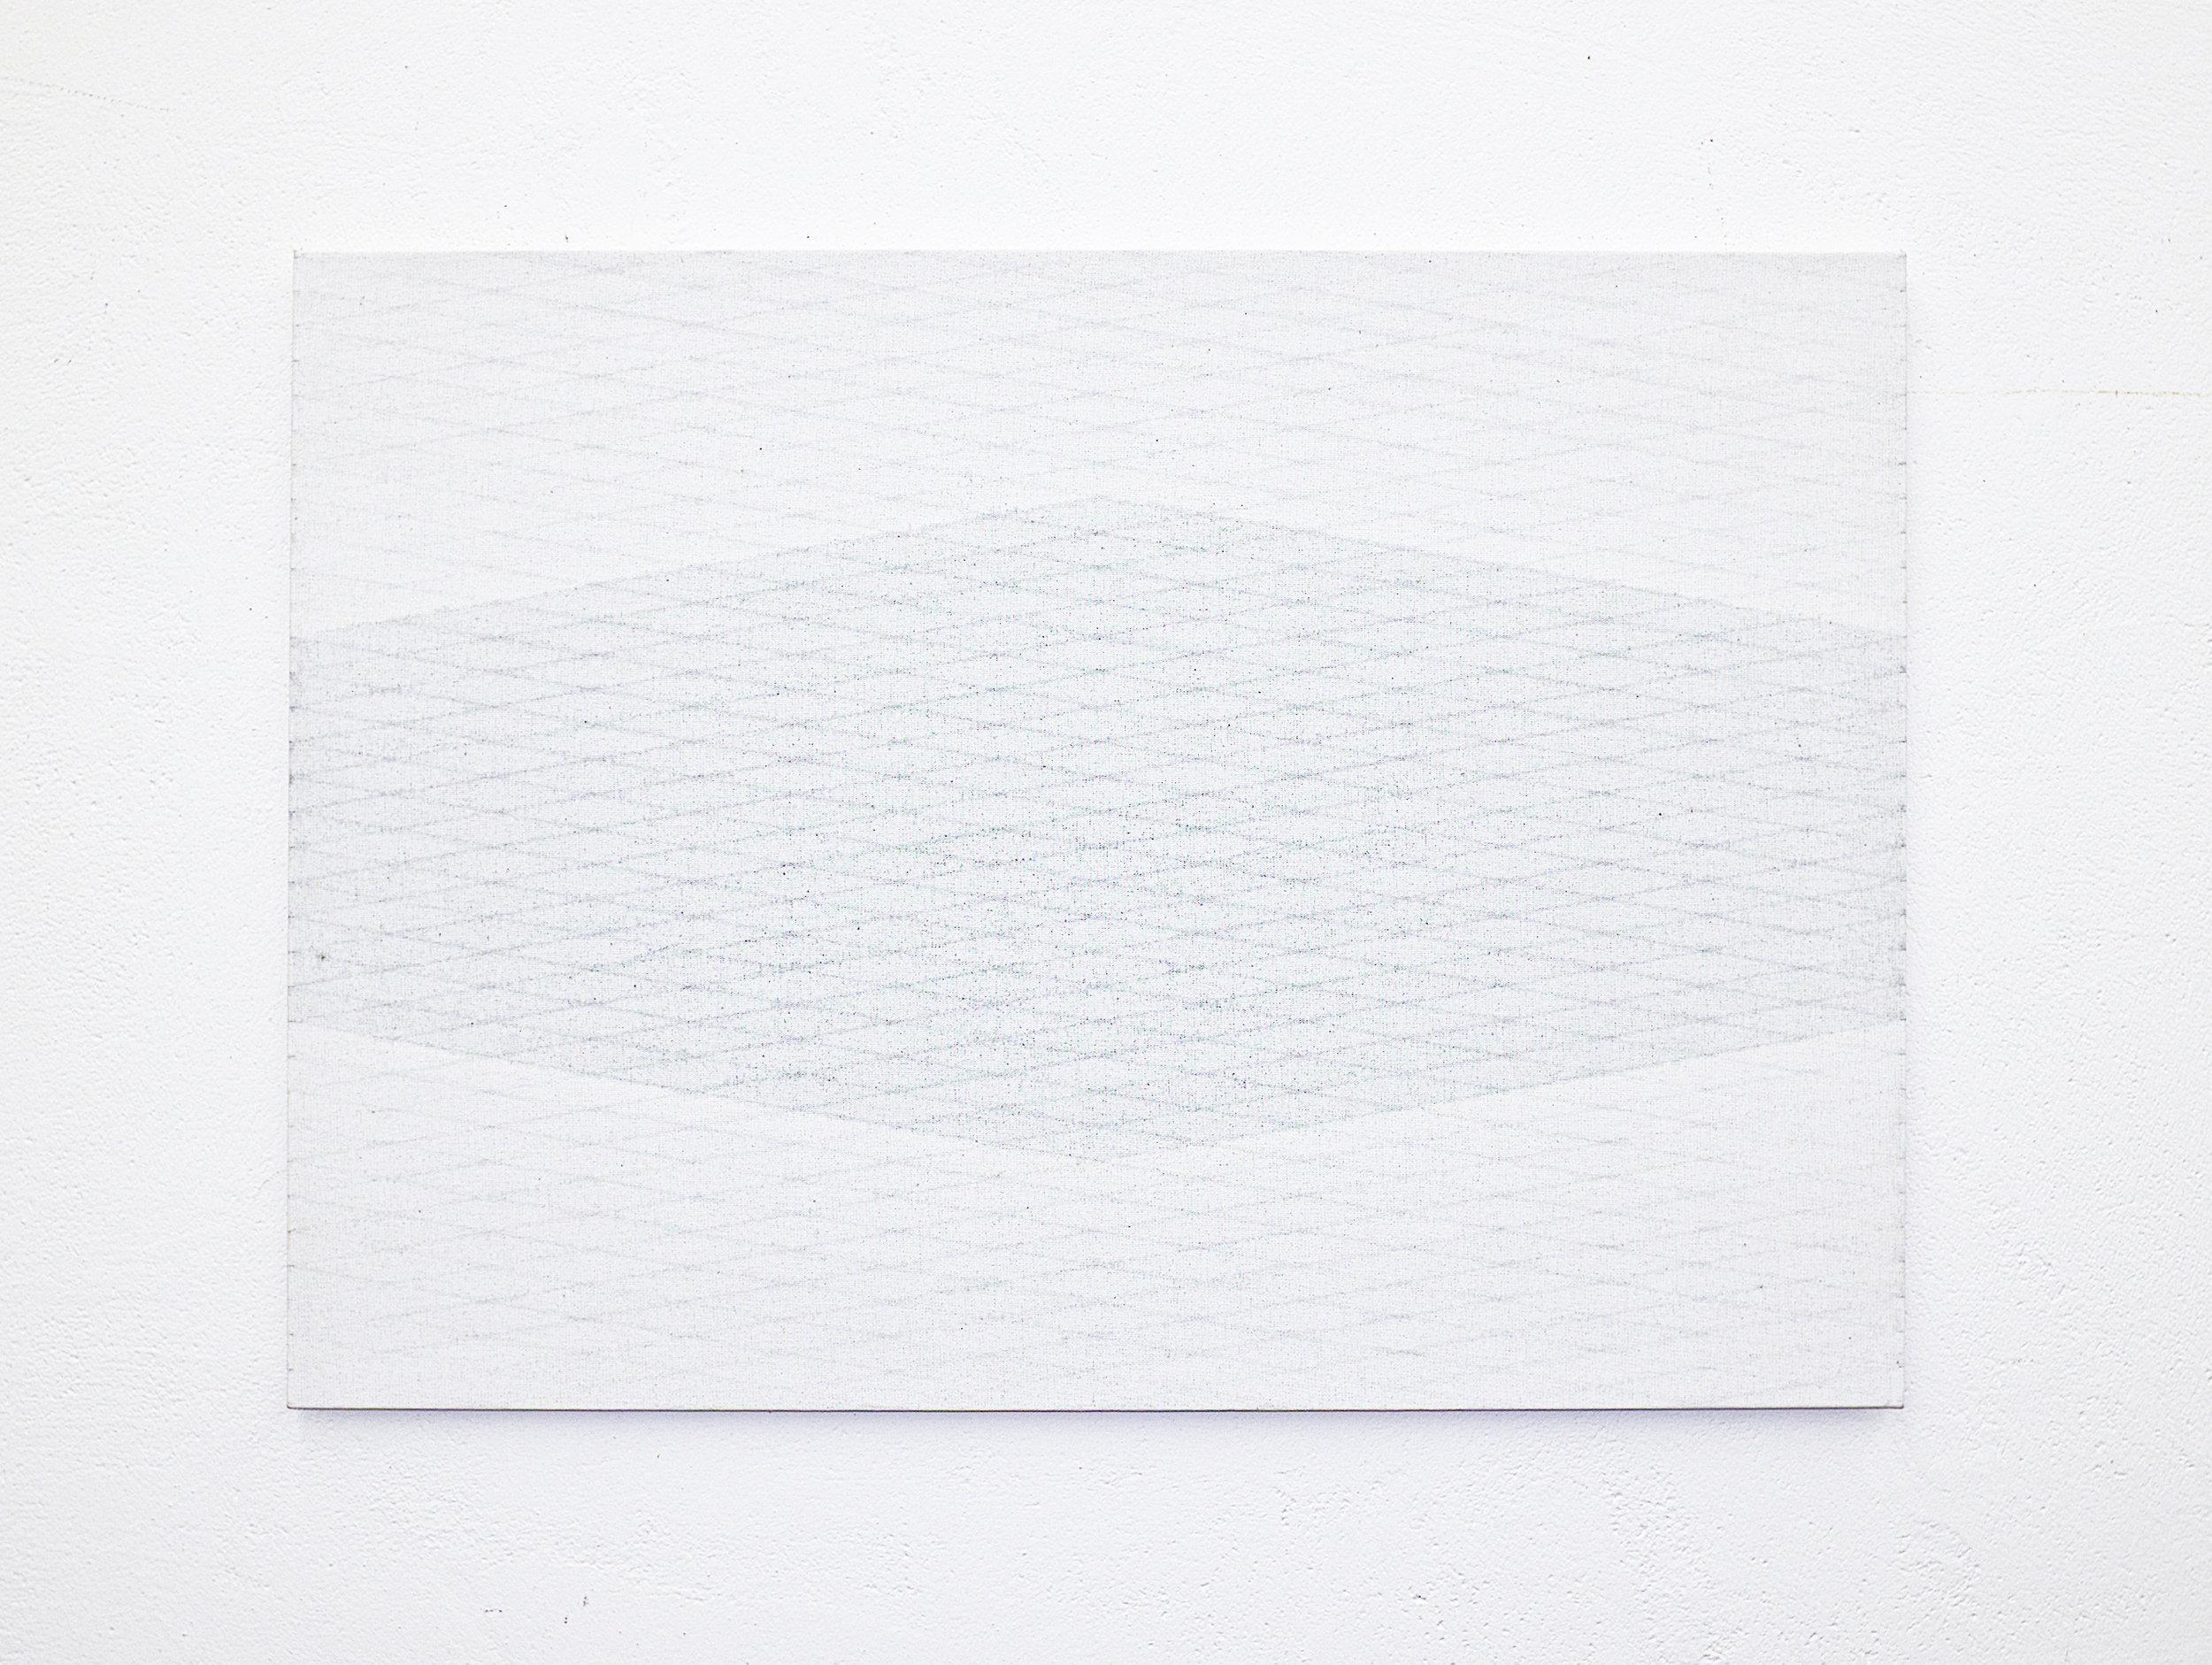 bild nr. 06/2015 - 50 x 70cm - acryl auf baumwolle/alu